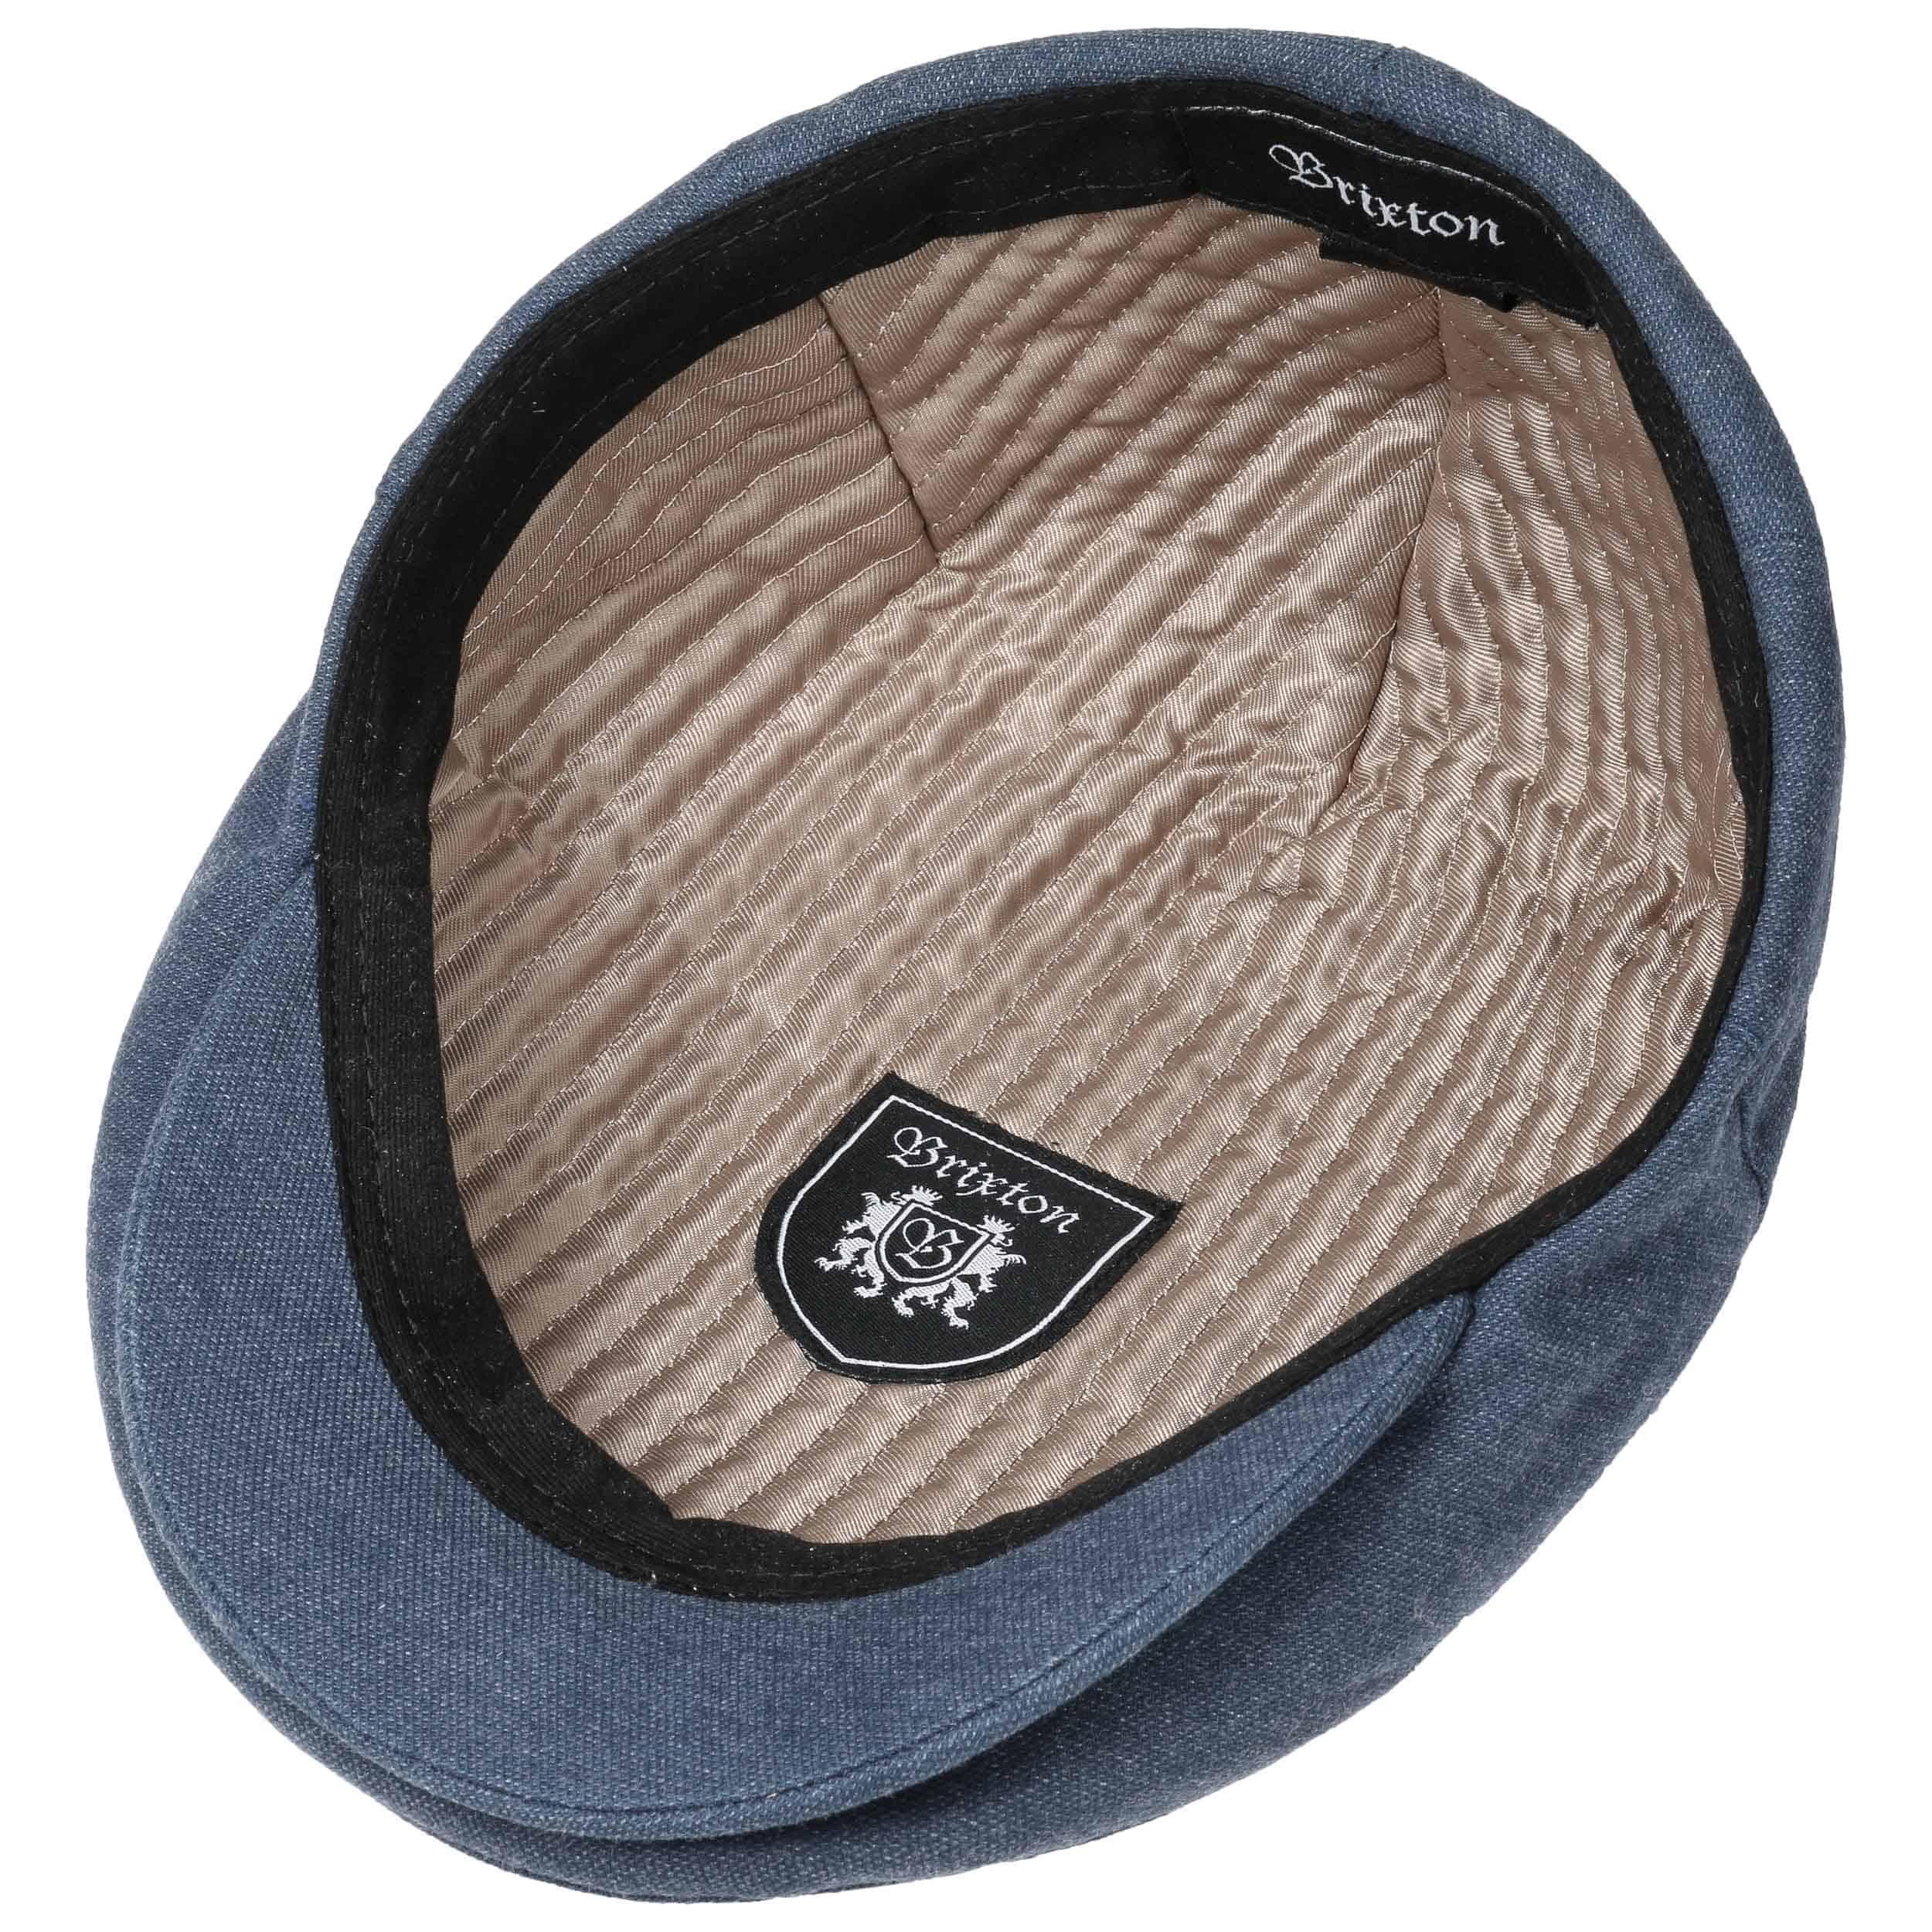 14d3953a ... discount code for hooligan uni flat cap by brixton blue 2 ffbc4 4b254